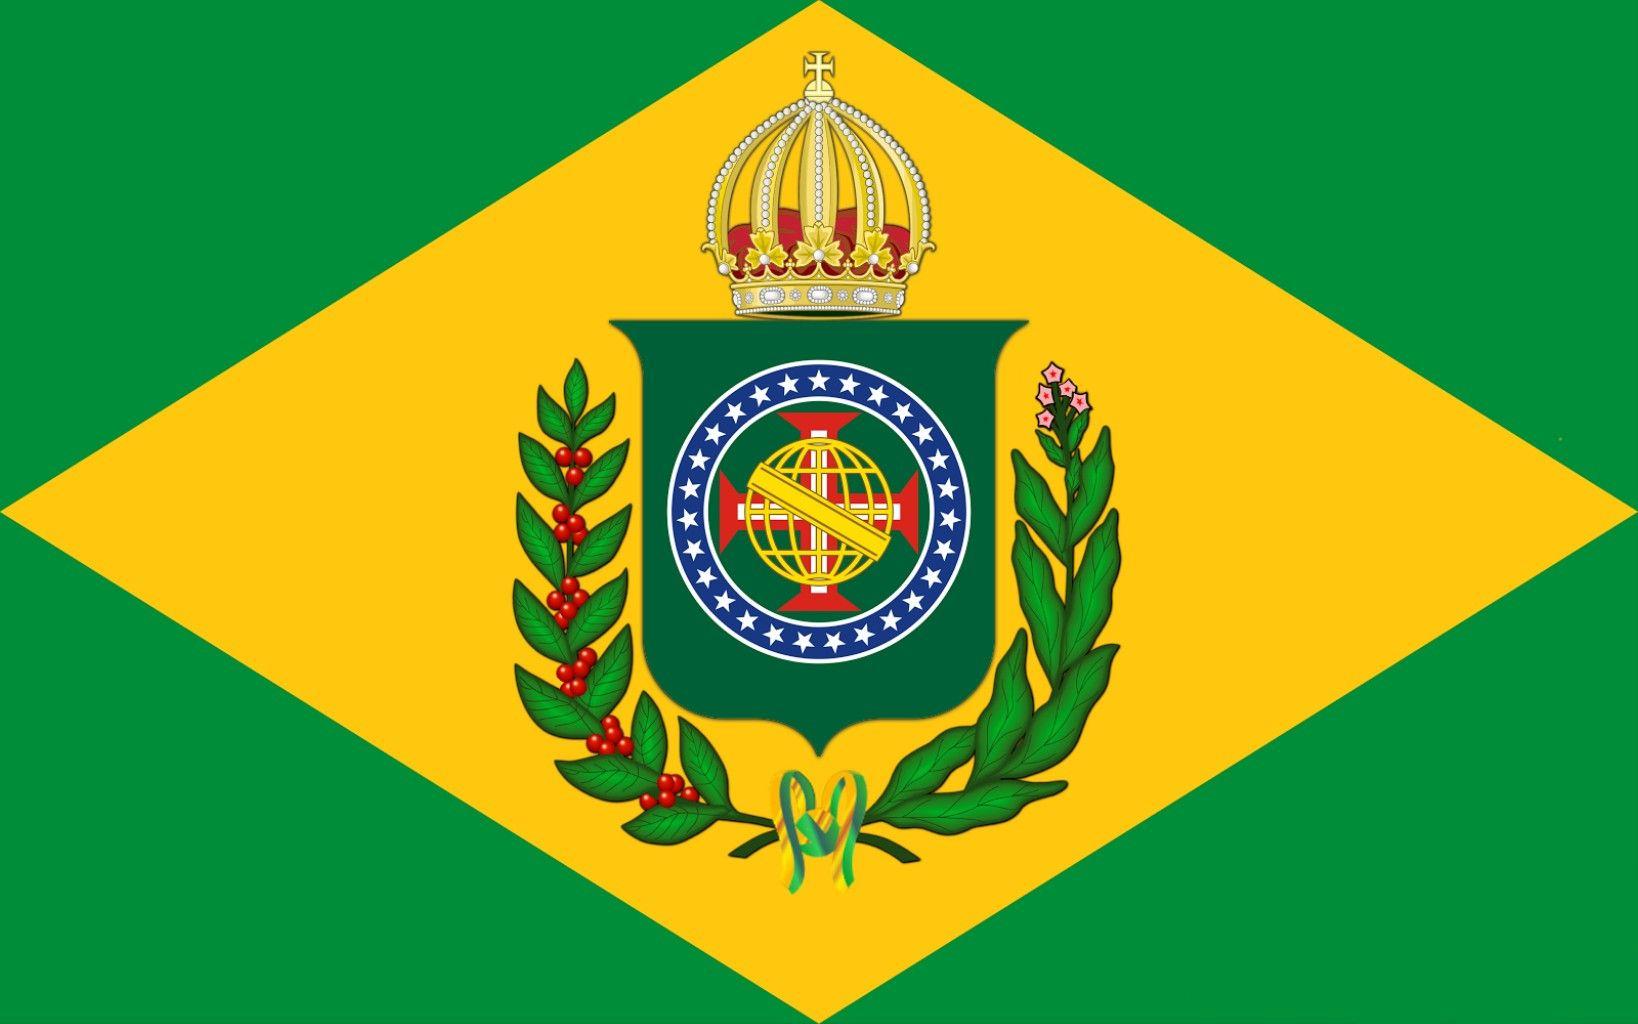 Bandeira Imperio Do Brasil Atualizada Flag Empire Of Brazil